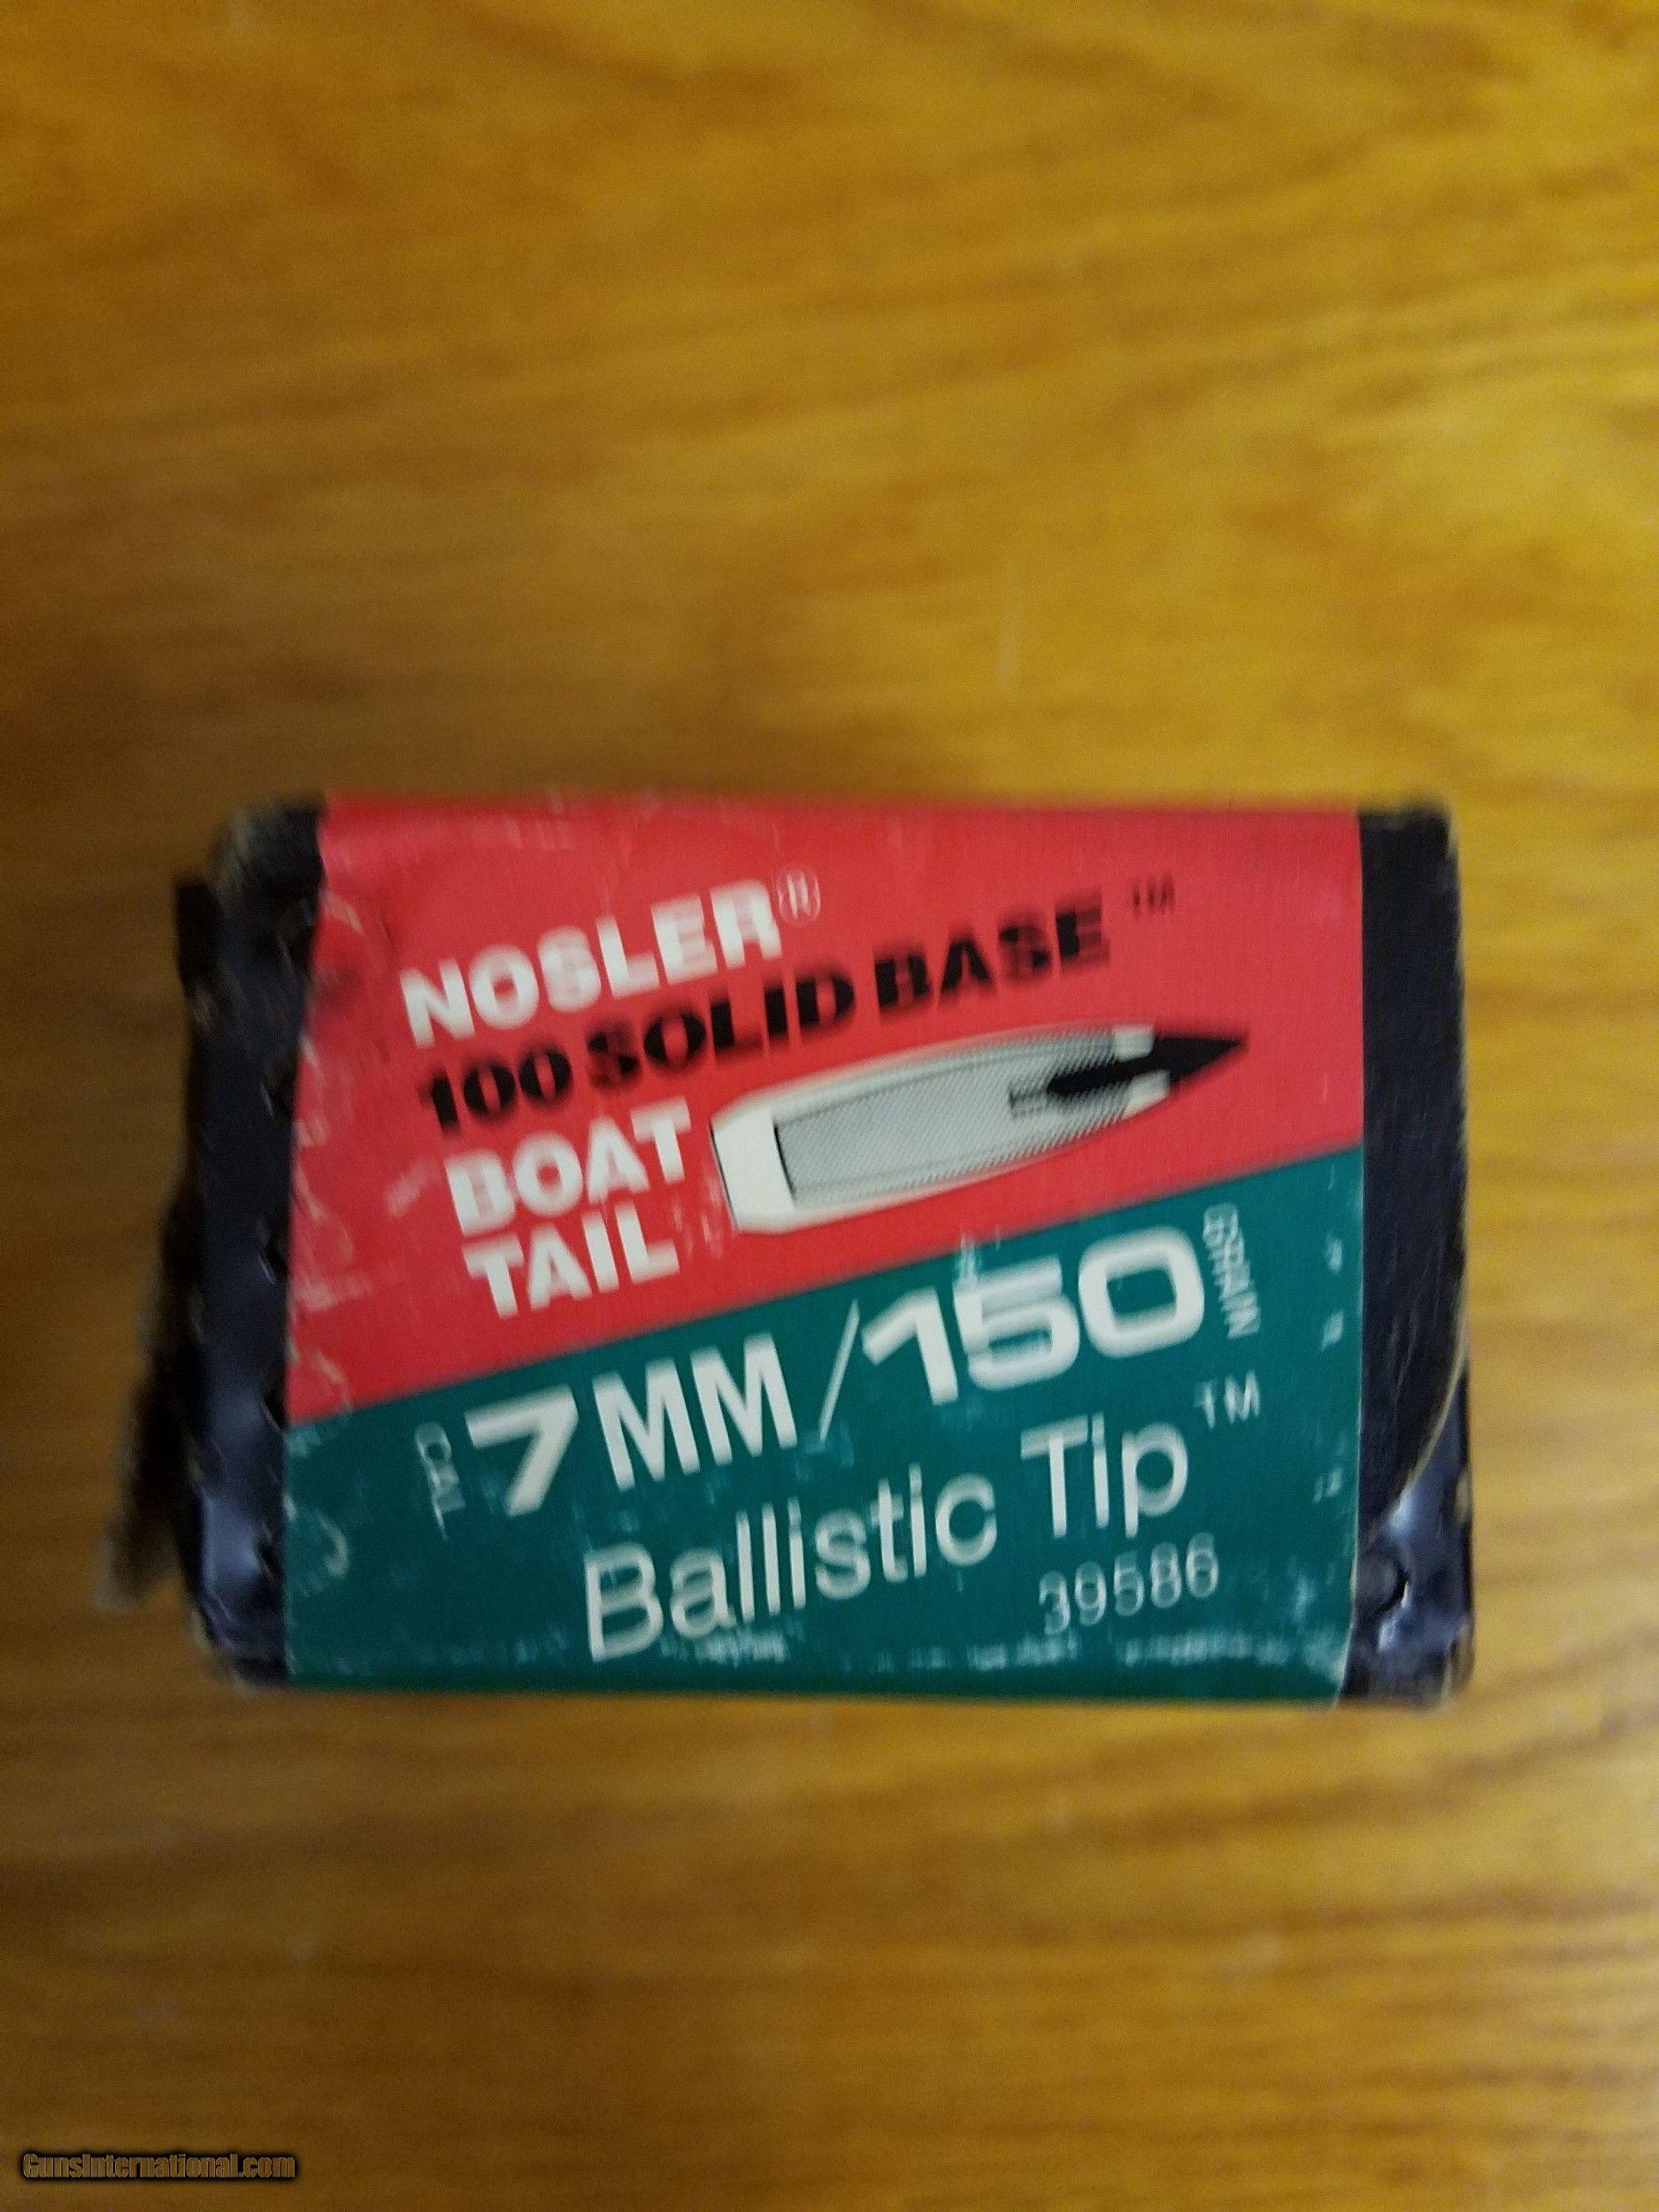 150gr 7mm ( 284) Nosler Ballistic tip, 882 count